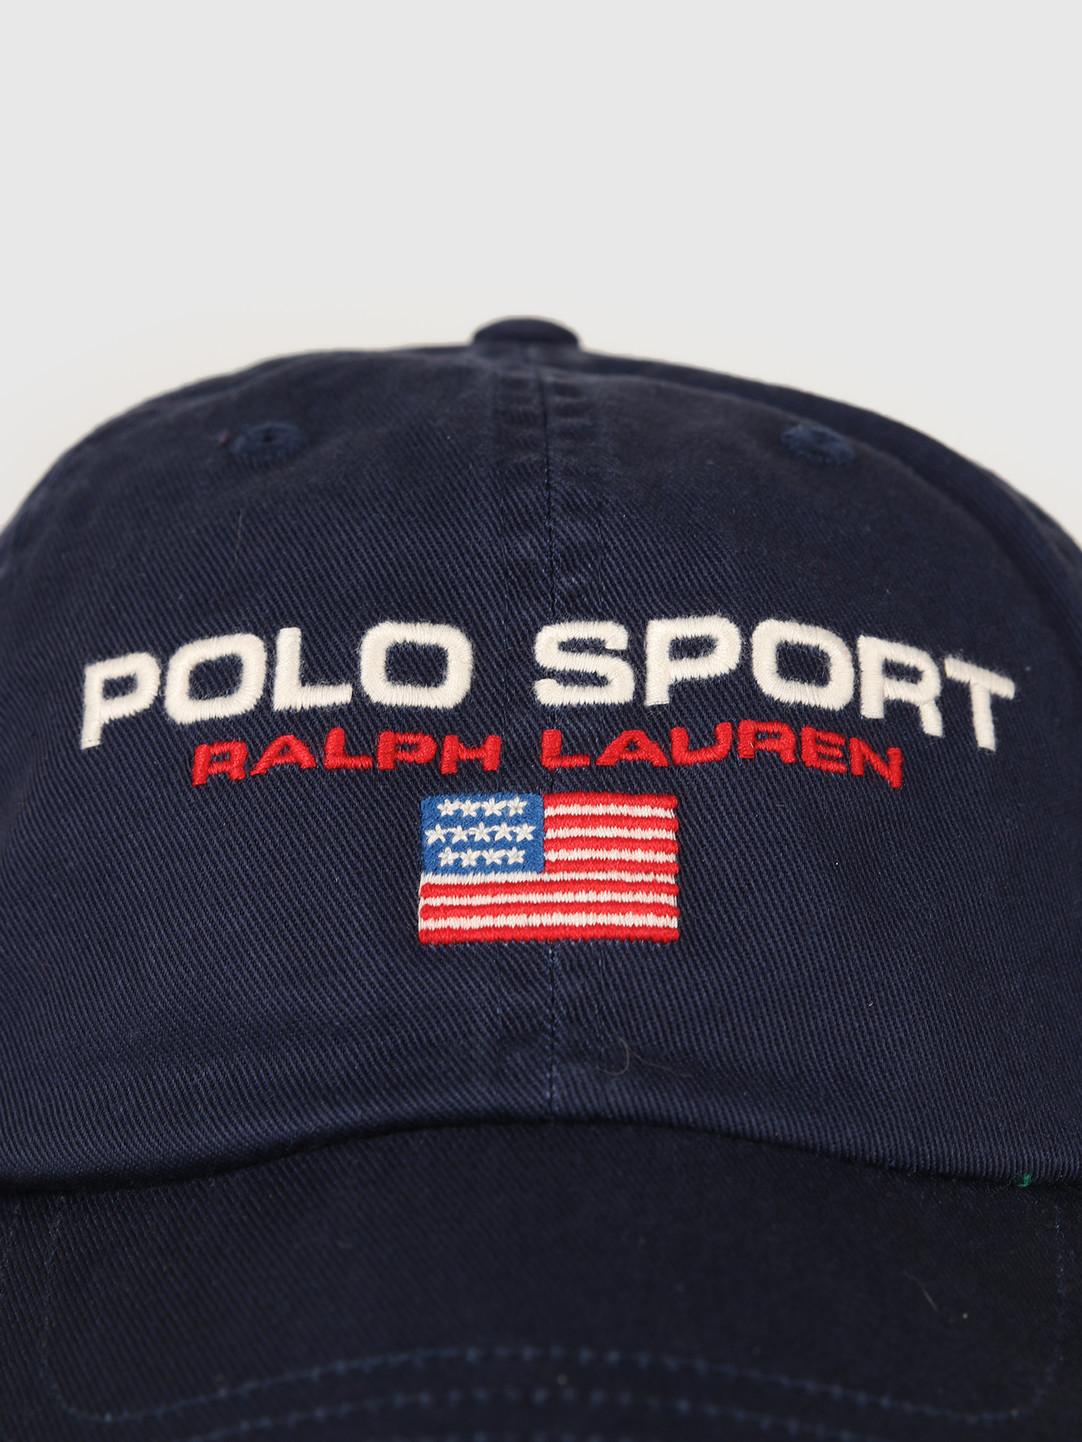 Polo Ralph Lauren Polo Ralph Lauren Classic Sport Cap Navy 710754471003